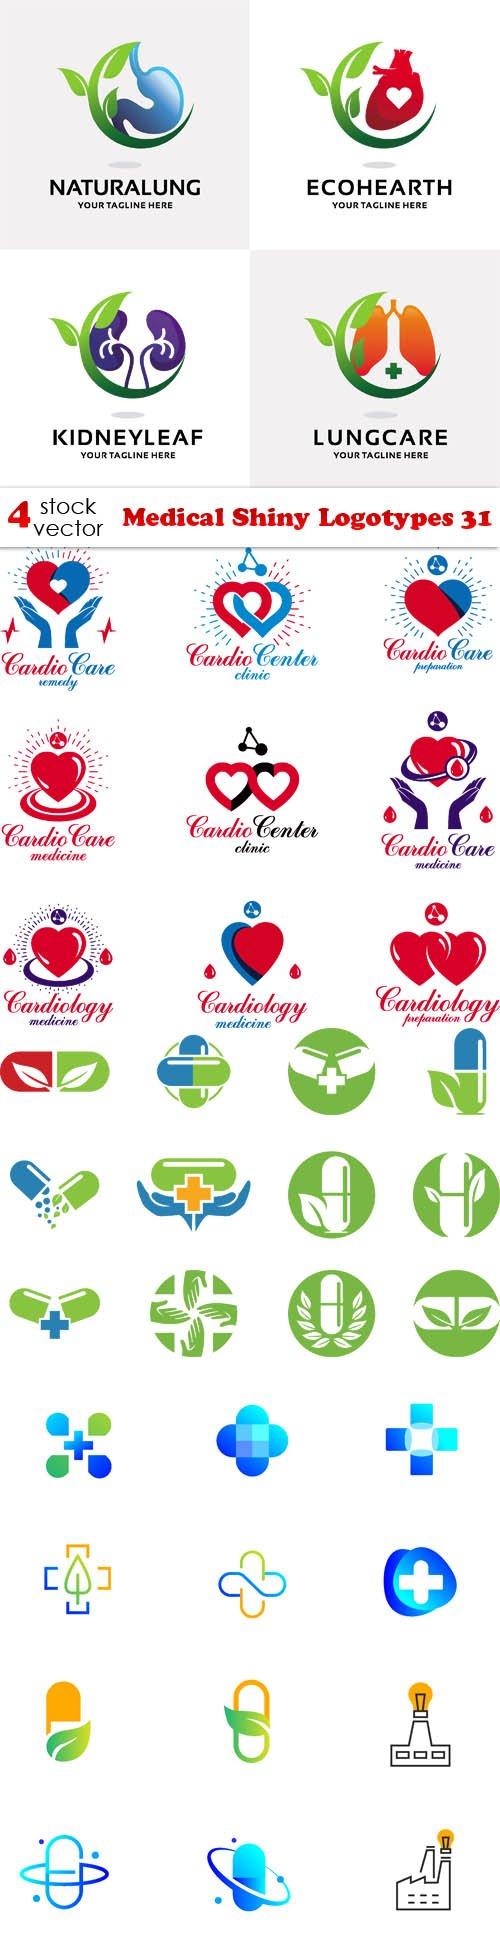 Vectors - Medical Shiny Logotypes 31